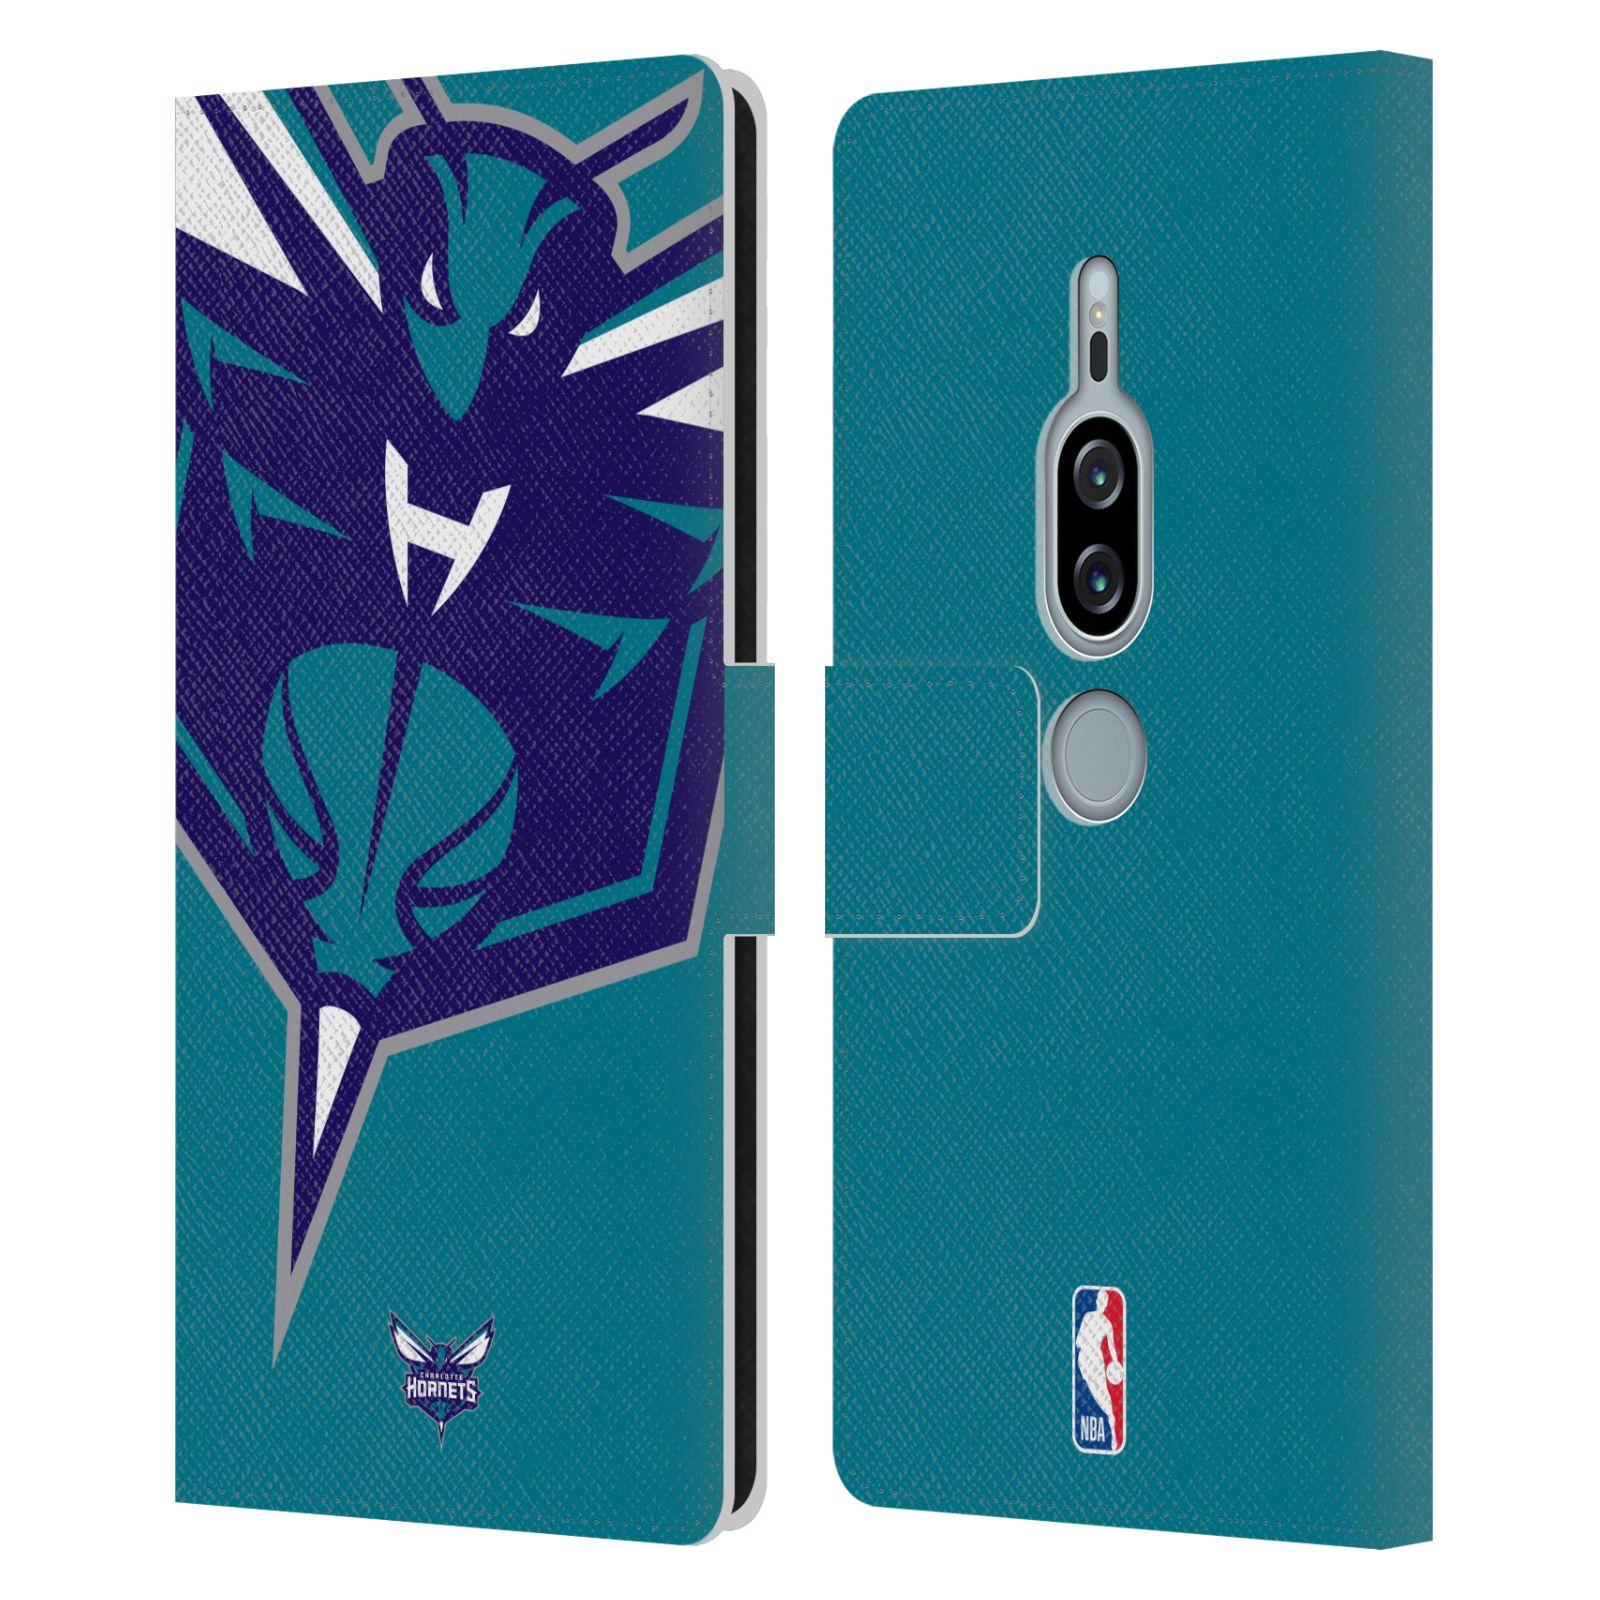 Pouzdro na mobil Sony Xperia XZ2 Premium - Head Case -NBA - Charlotte Hornets modrá barva velký znak